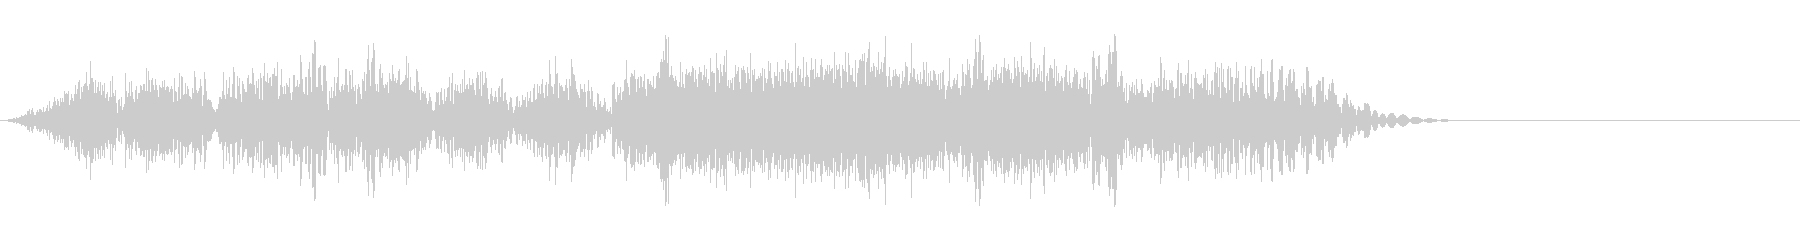 DJスクラッチ03_リバース音03の未再生の波形